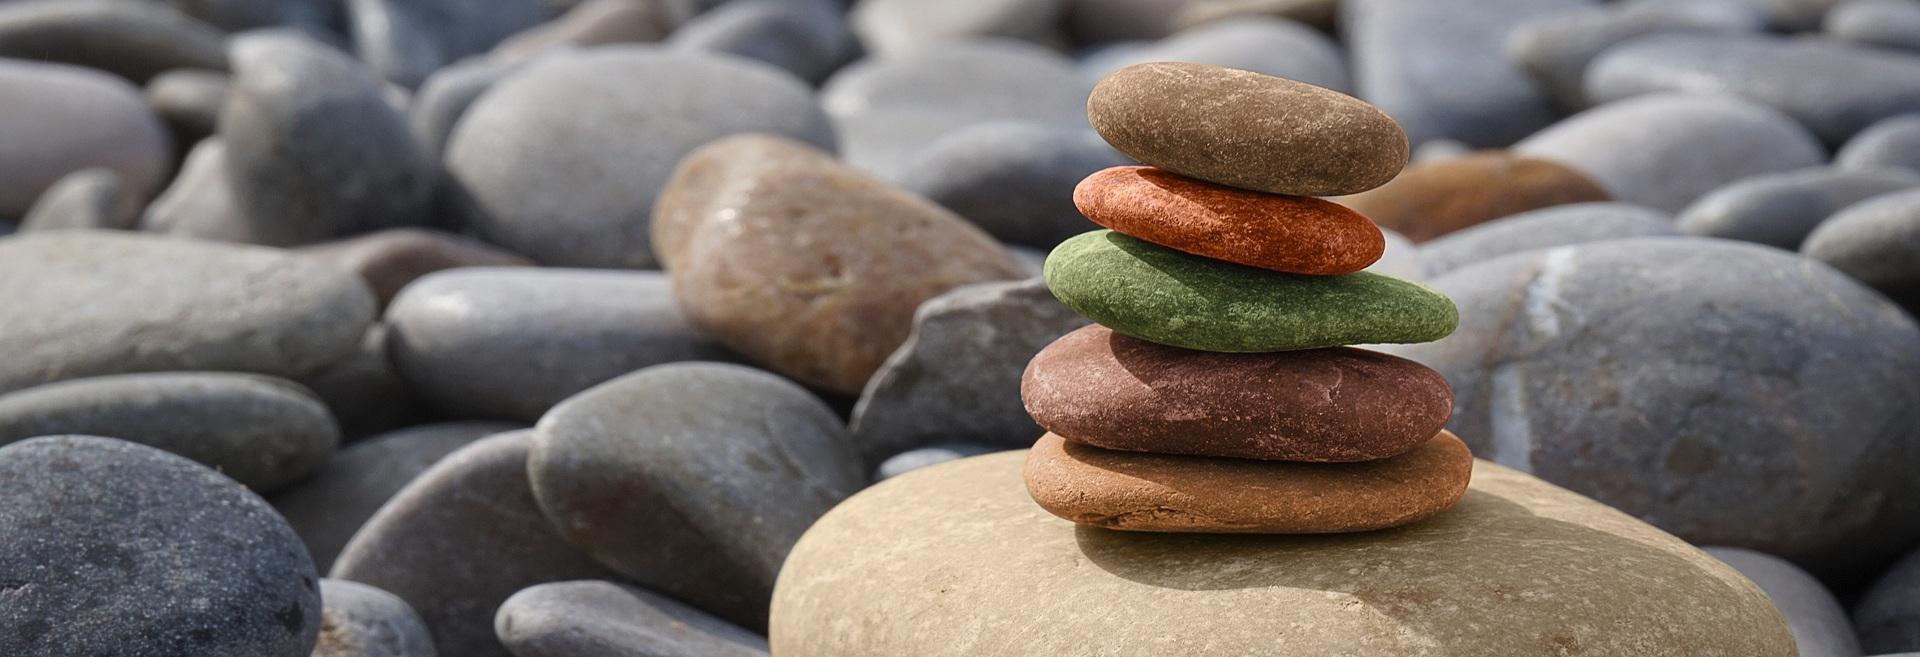 stones-2043714_1920a